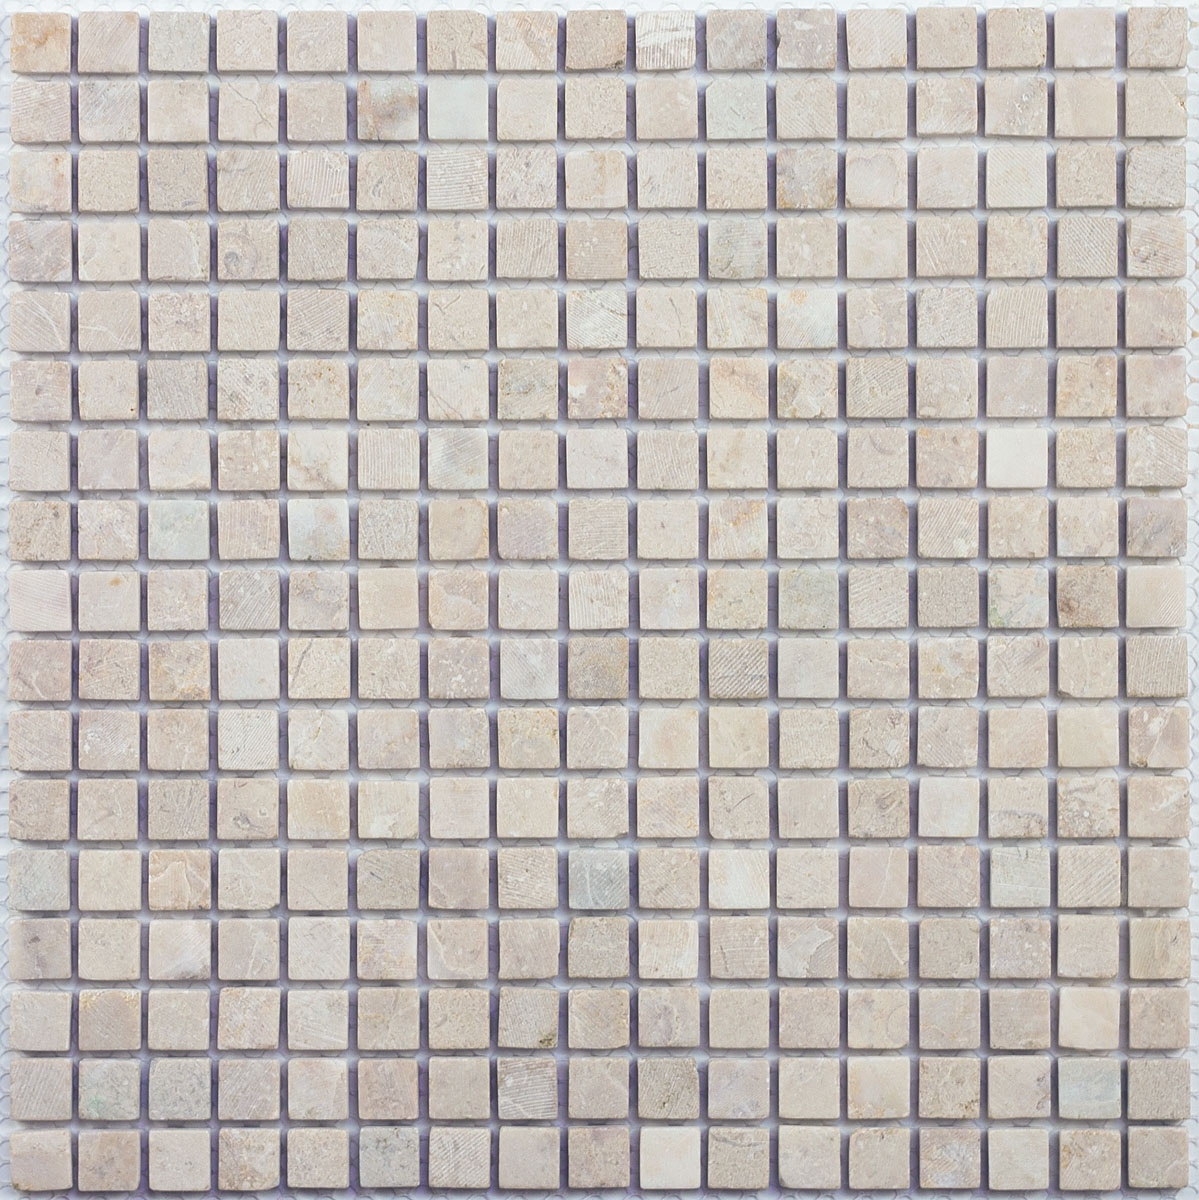 Мозаика из натурального камня Cappuccino beige MAT 15x15x7